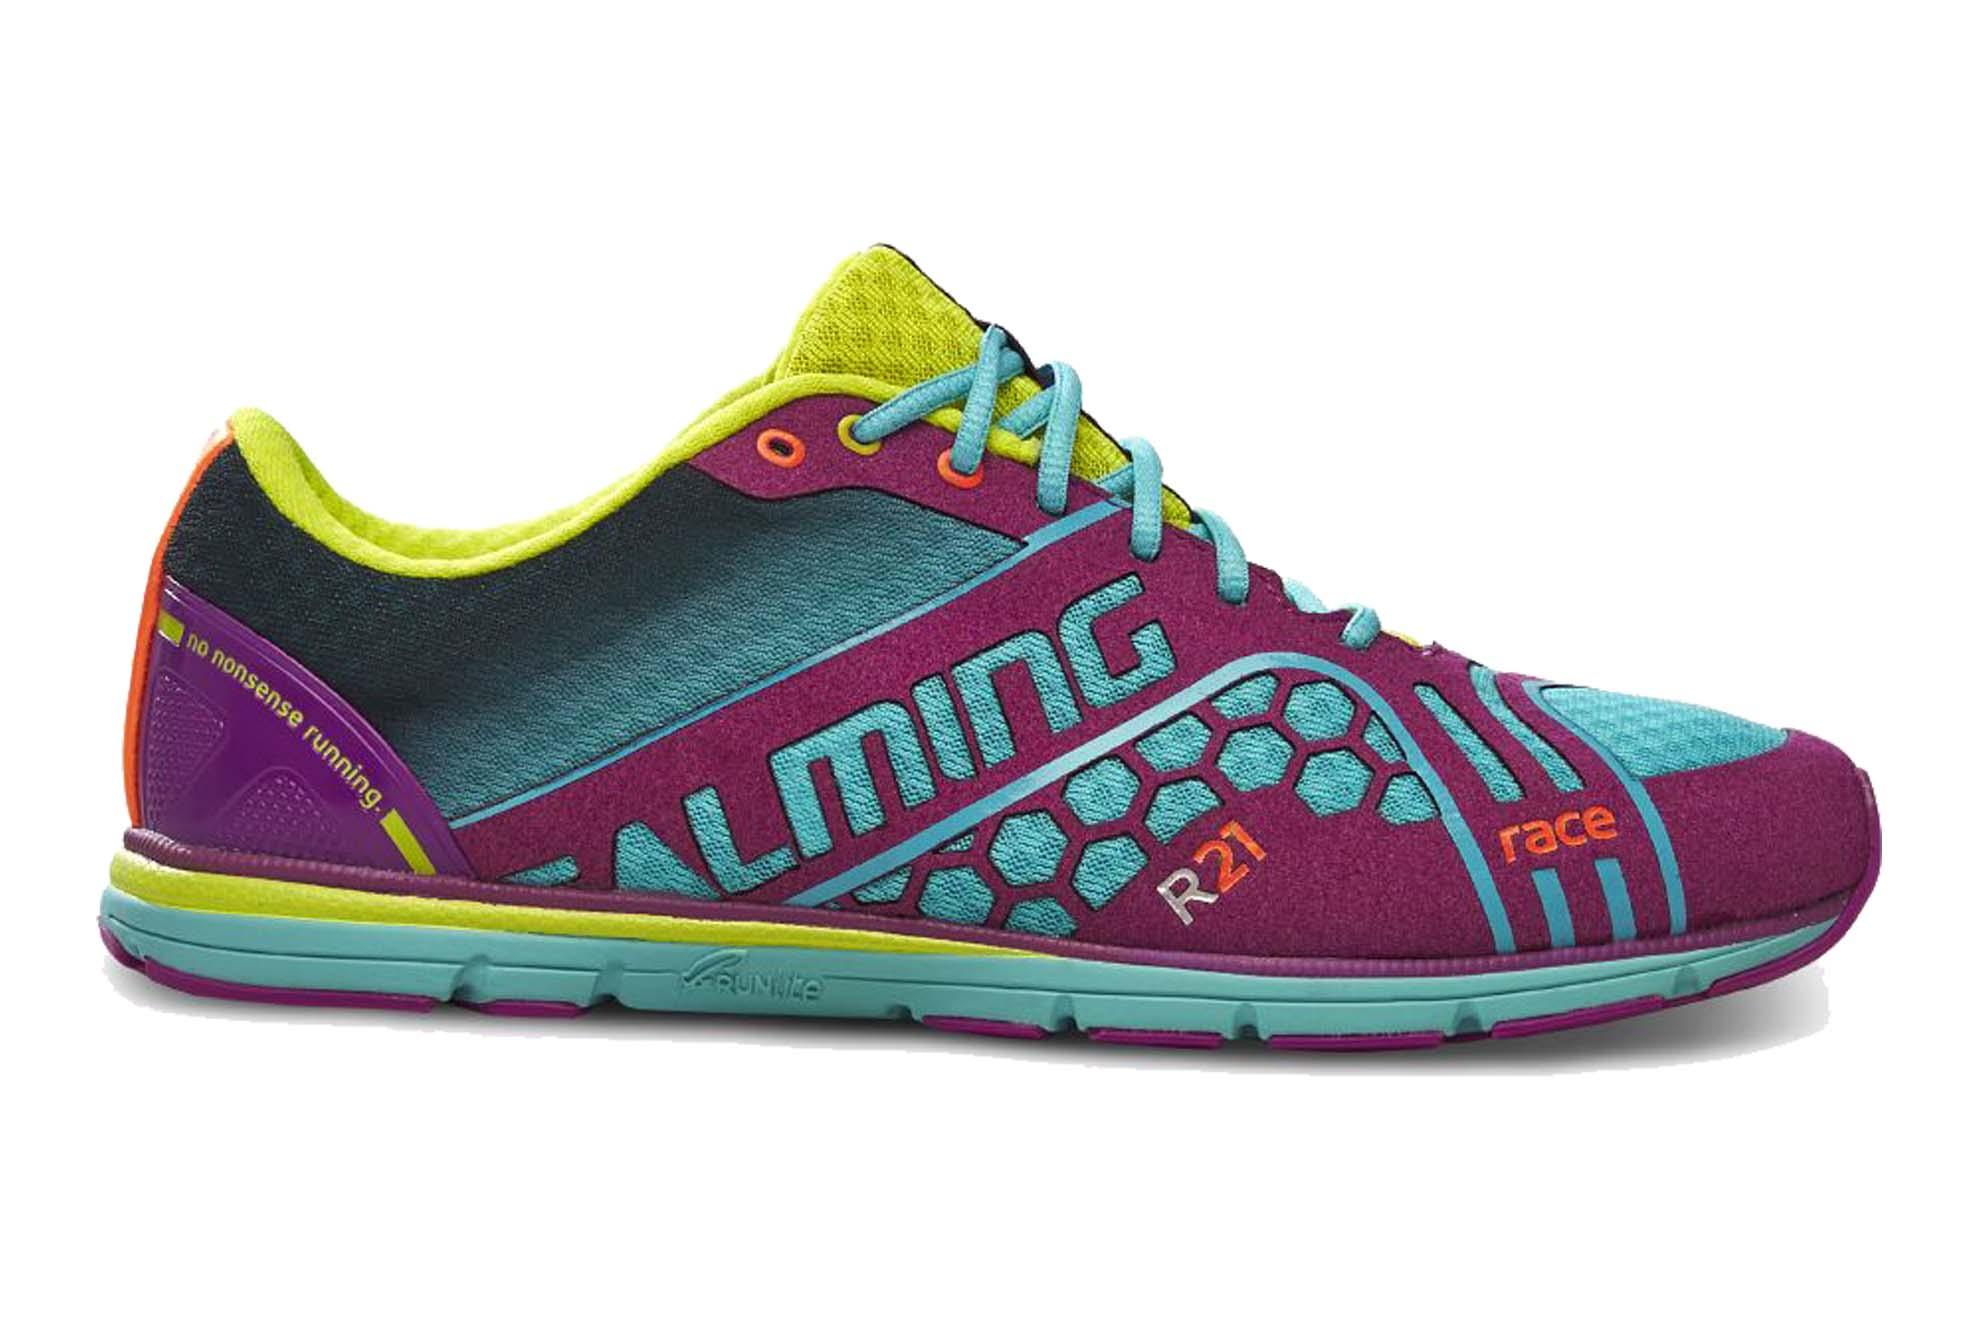 540dd9ab1cf Běžecké boty. SALMING Race 3 Shoe Women Turquoise Purple